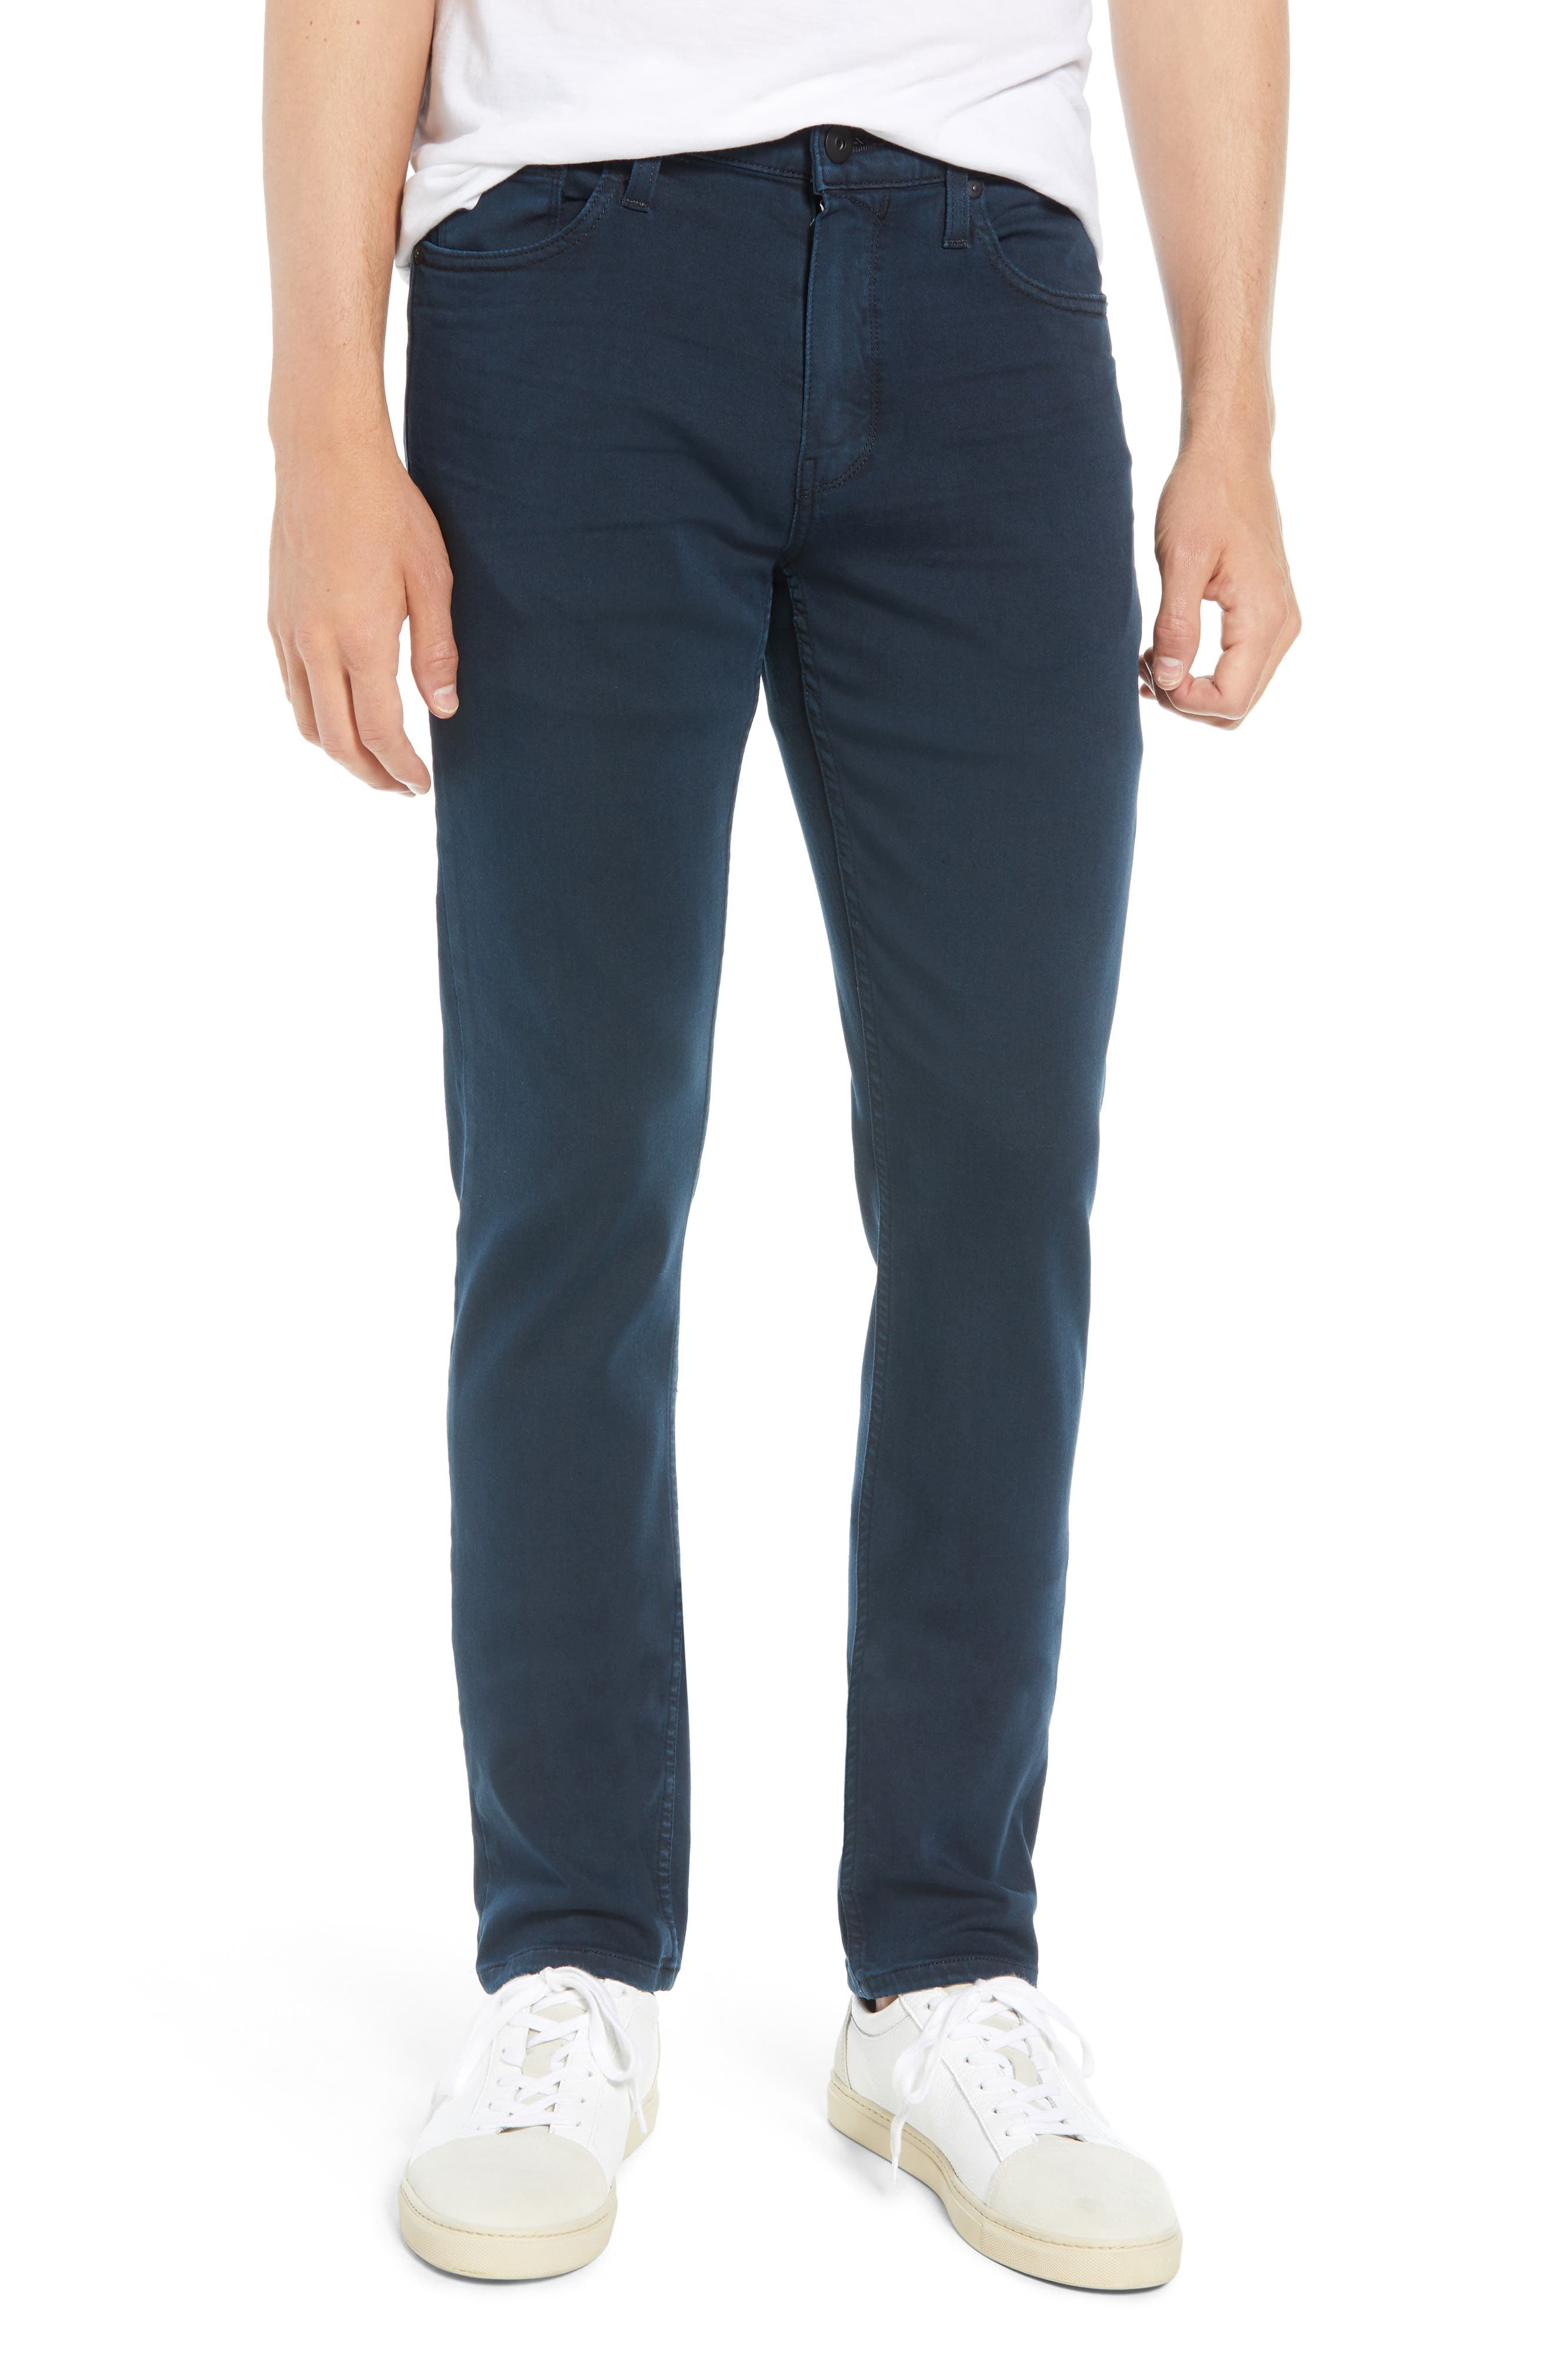 Transcend - Lennox Slim Jeans,                             Main thumbnail 1, color,                             401